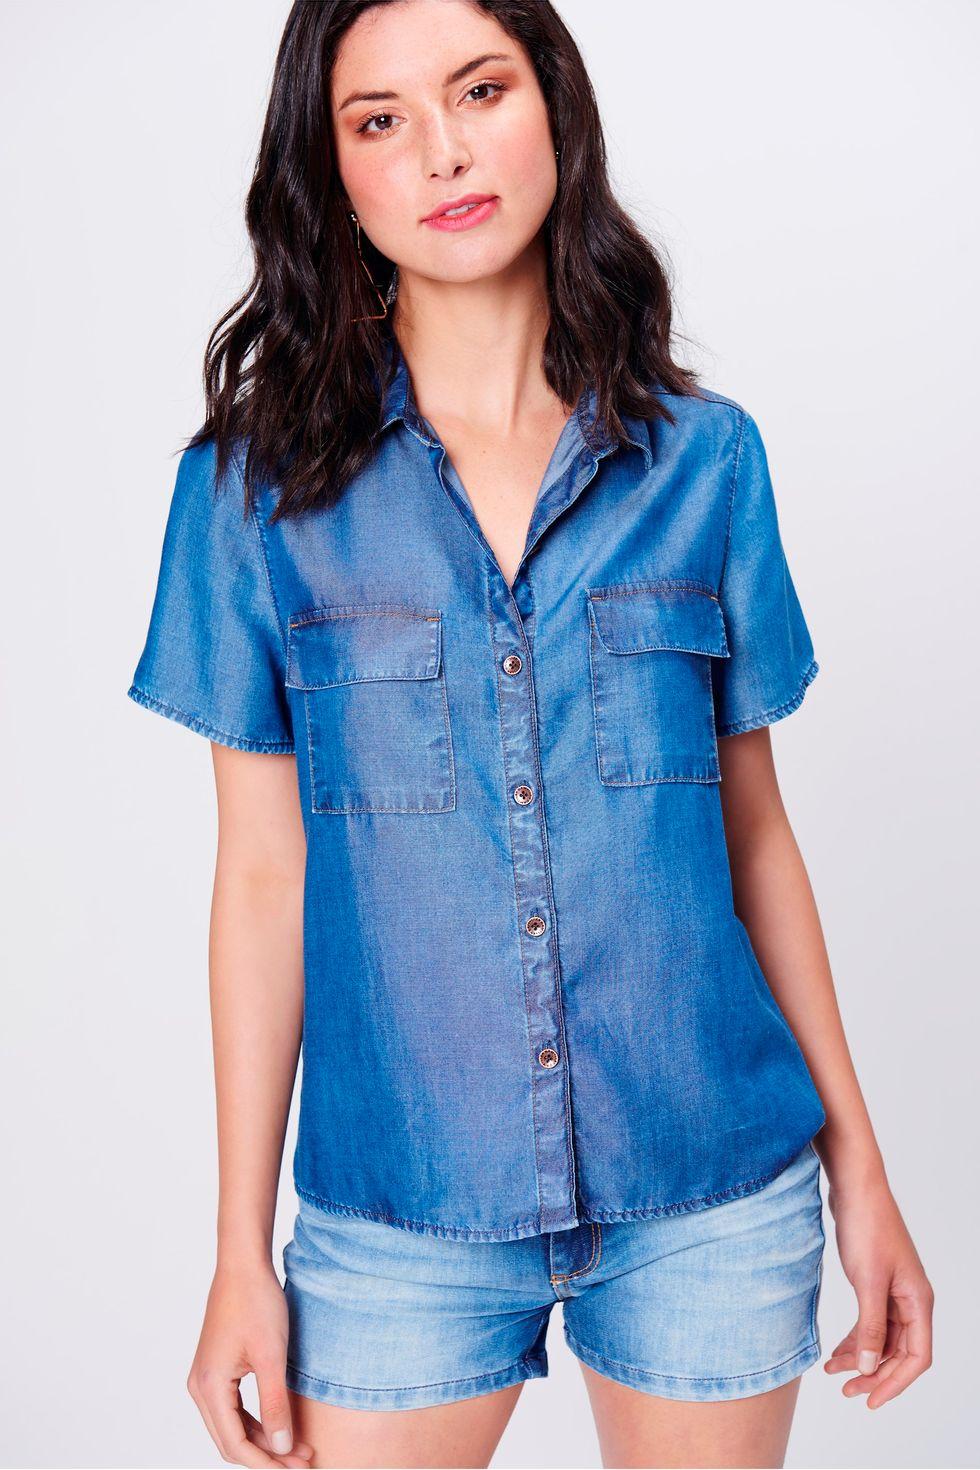 71d063a5b Camisa Jeans de Manga Curta Feminina - Damyller